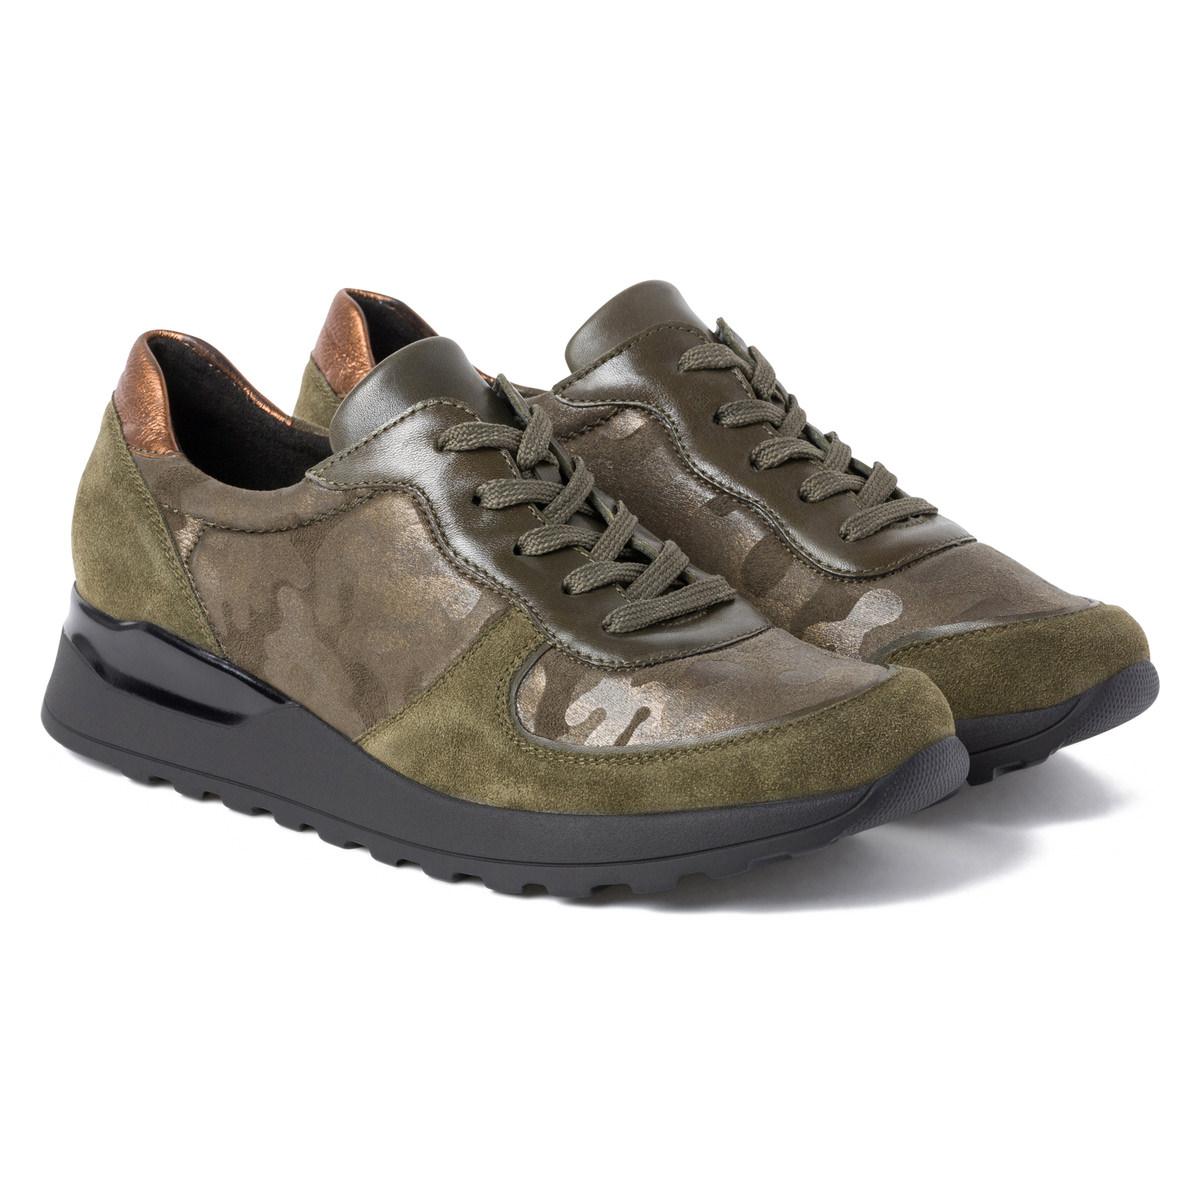 Sneaker Camouflage Oliv 0QfklfUC